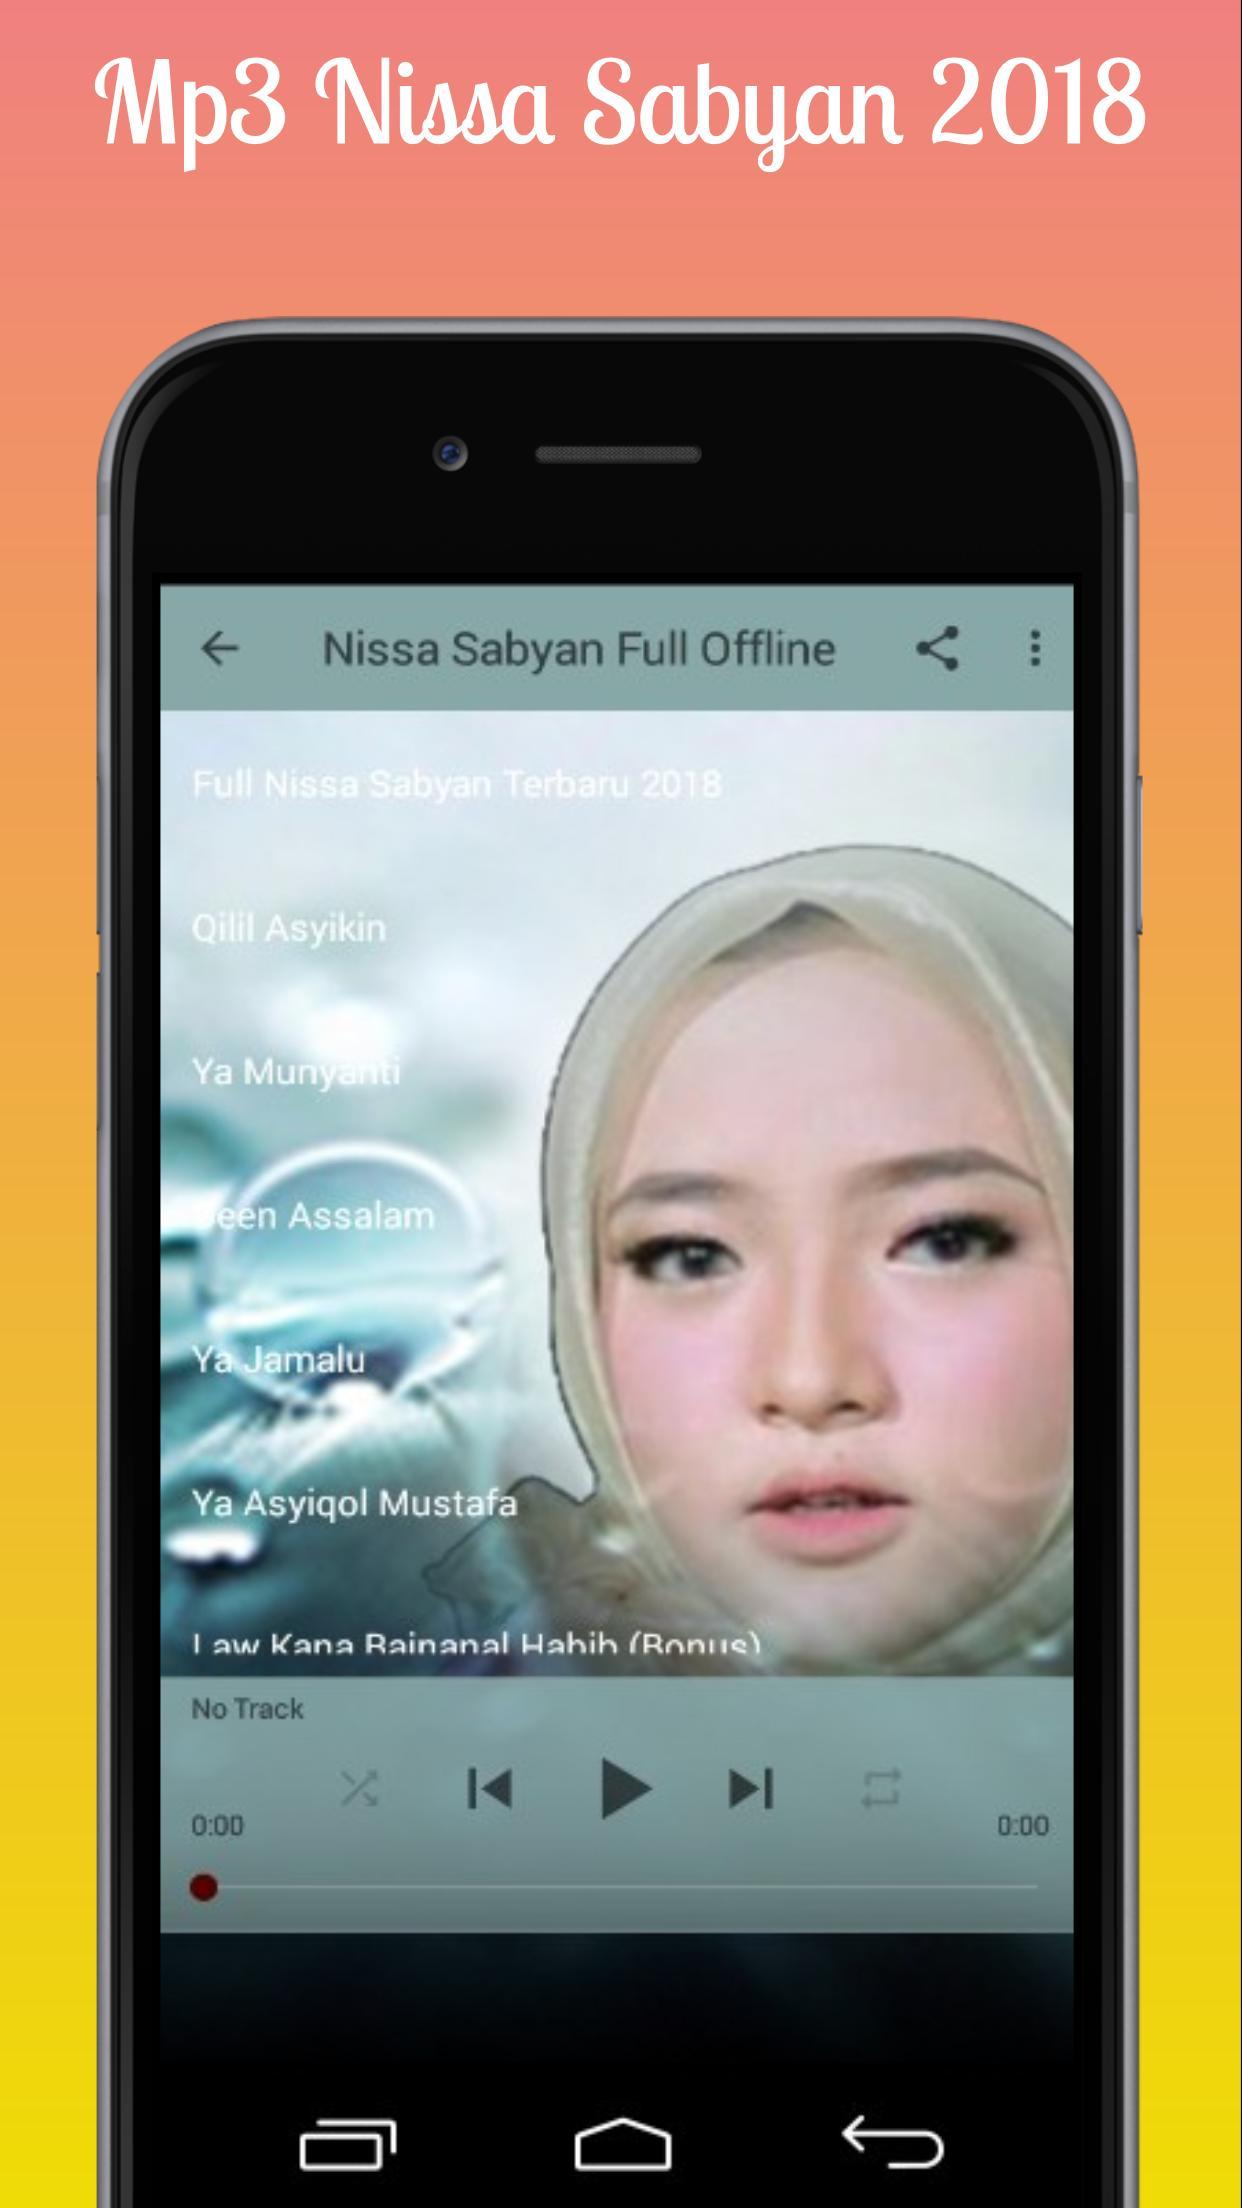 🏆 Download mp3 full album nissa sabyan 2018 | Download Lagu